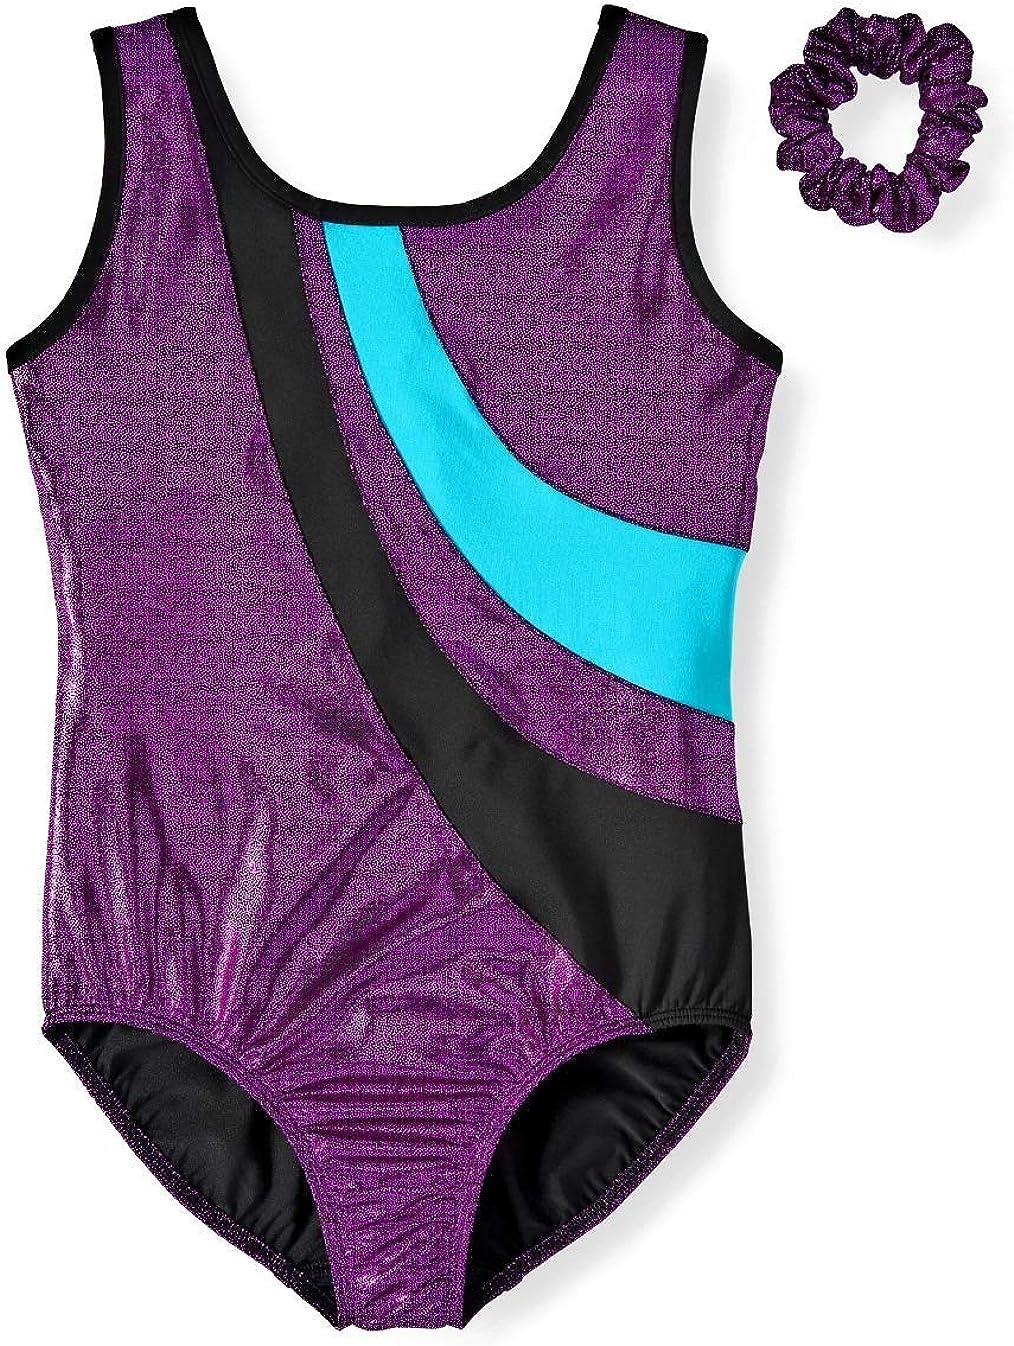 JESKIDS Leotards for Girls Gymnastics with Shorts Unicorn Rainbow Unitards